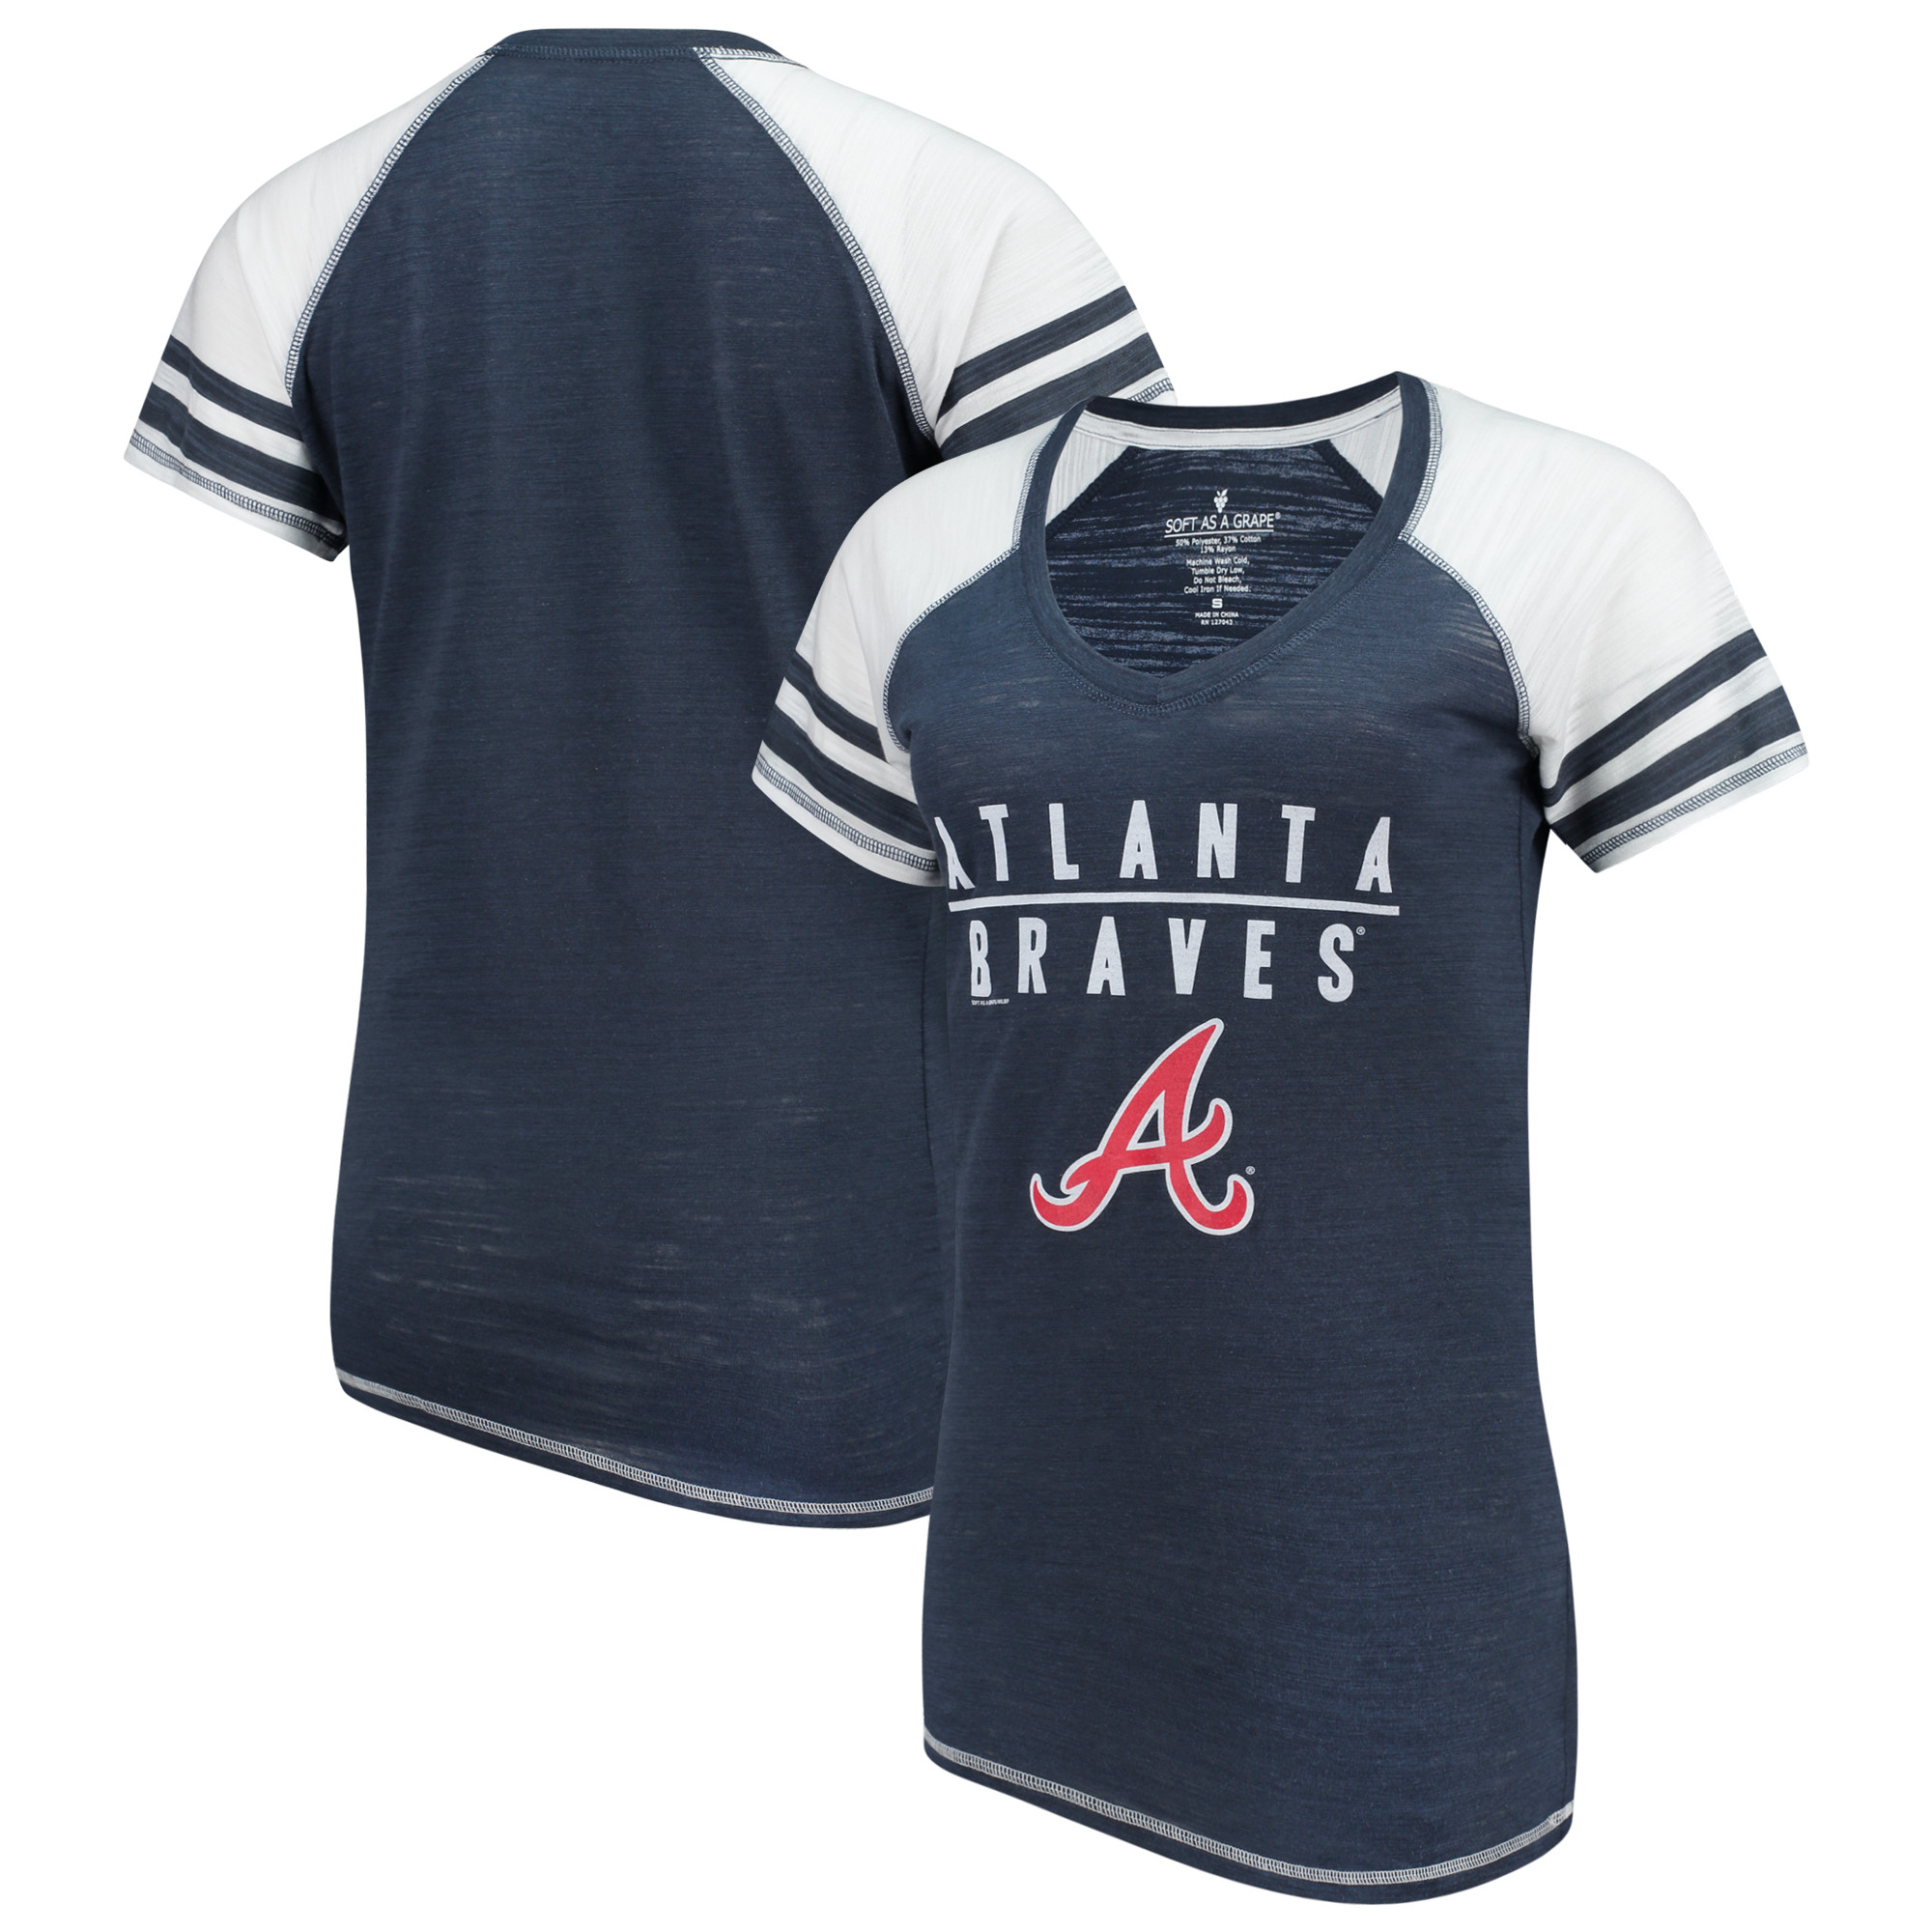 Atlanta Braves Soft as a Grape Women's Color Block V-Neck T-Shirt - Navy